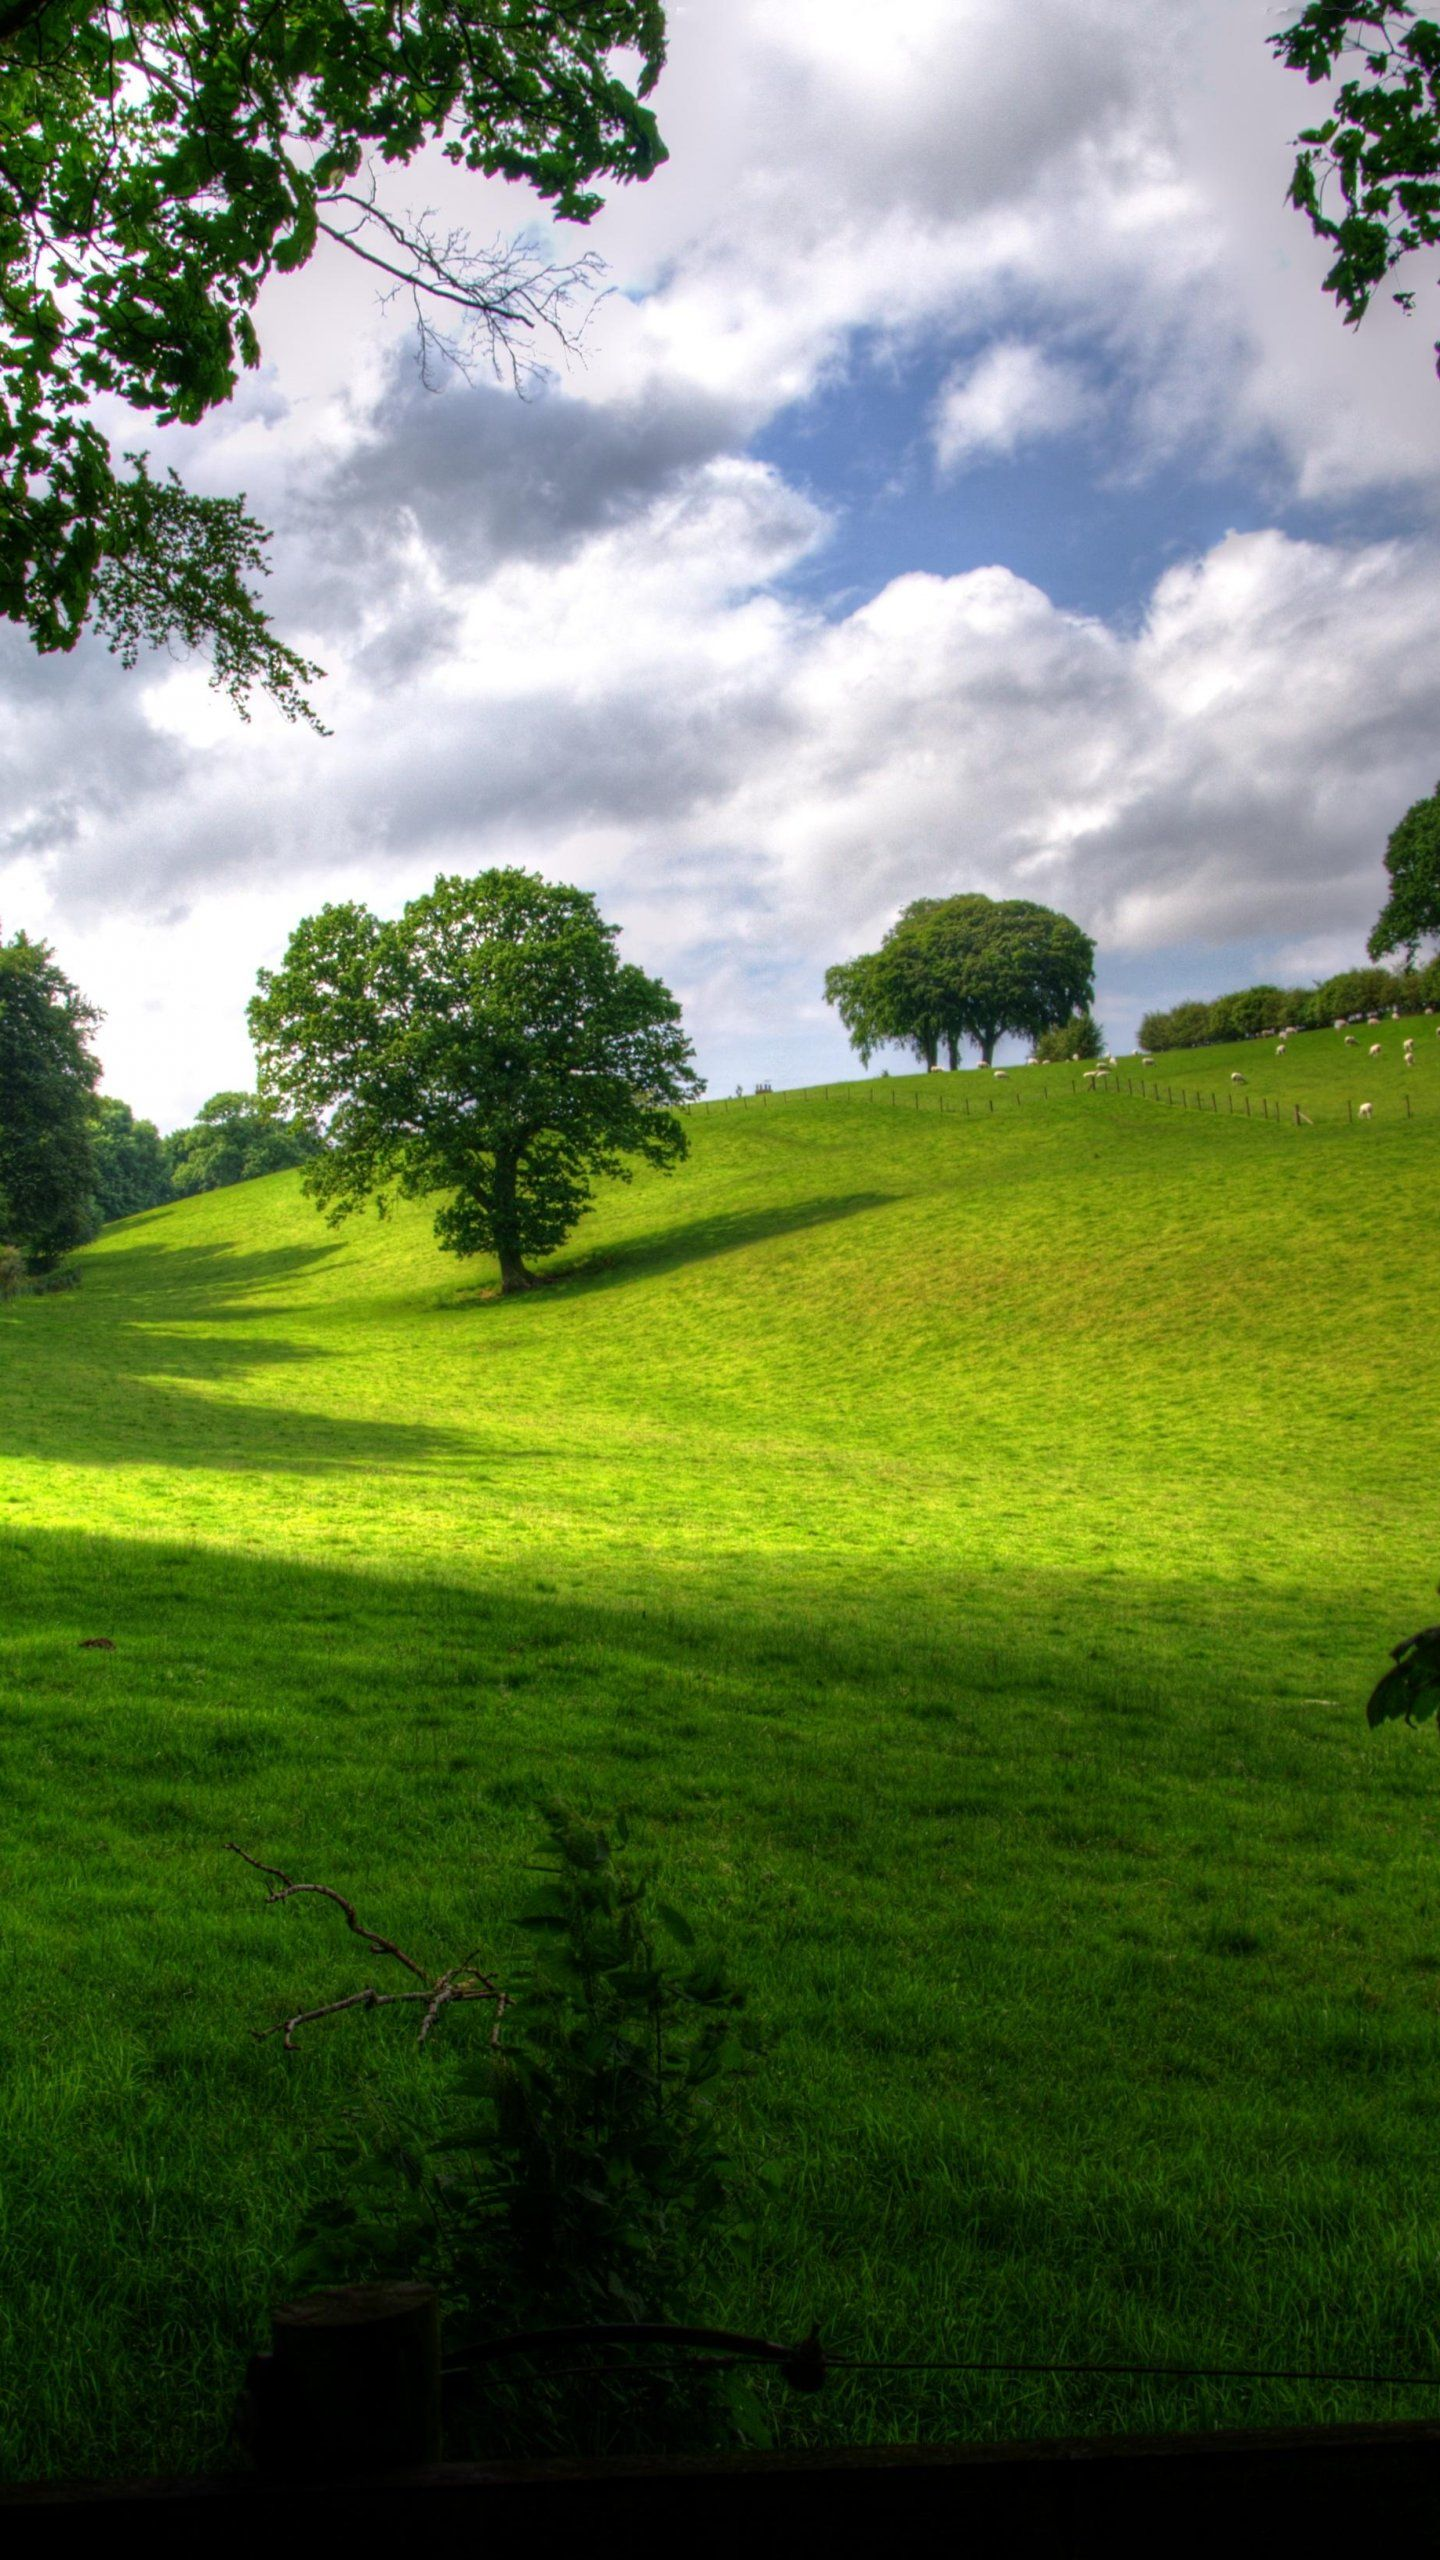 Bright Light Meadow Wallpaper Iphone Android Desktop Backgrounds Landscape Wallpaper Best Nature Wallpapers Nature Wallpaper